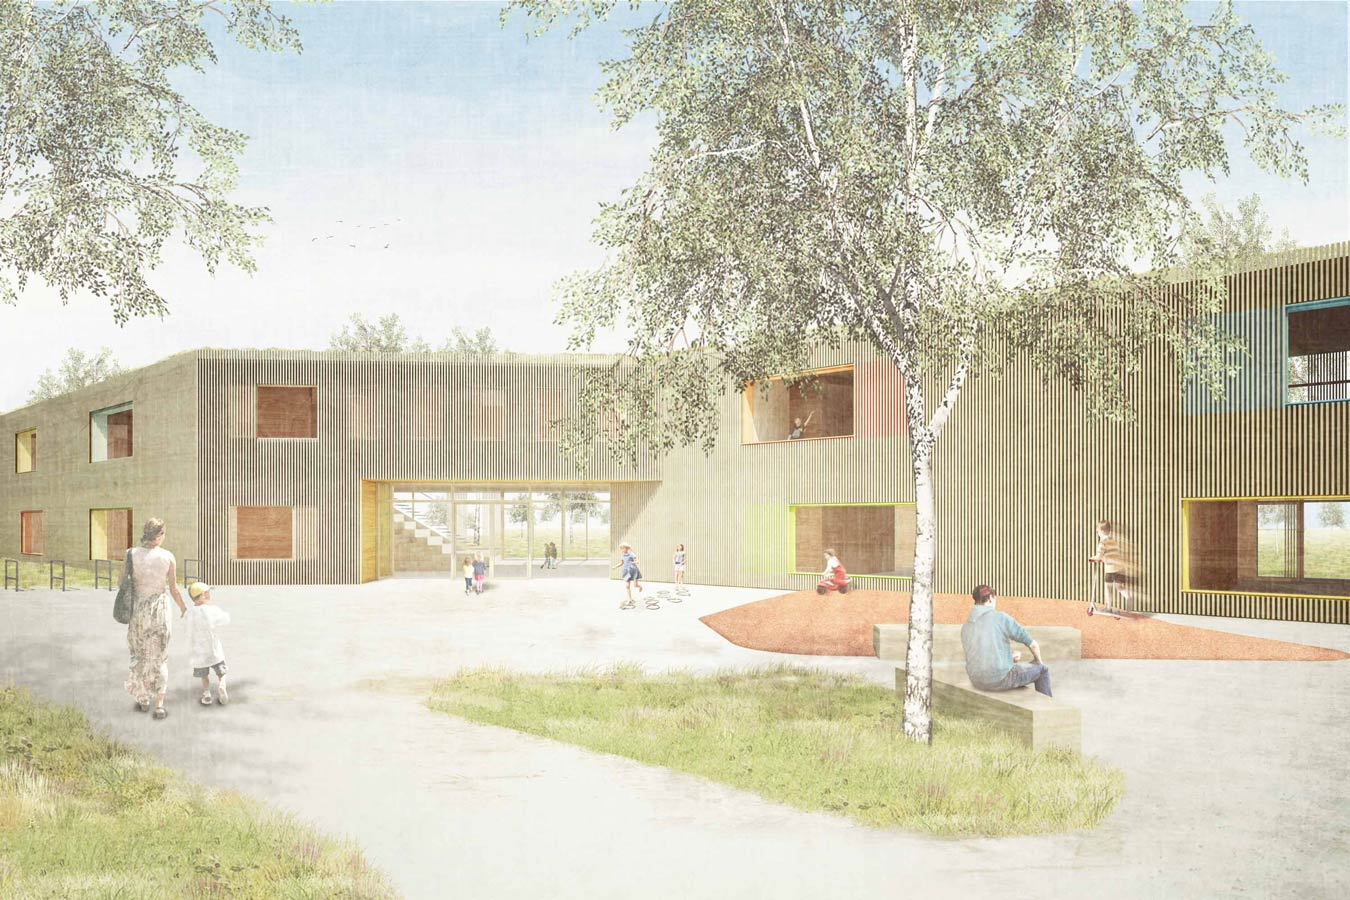 STUDIOKUBIK-studio-kubik-architektur-architecture-berlin-Kindertagesstätte-Velten_Platz